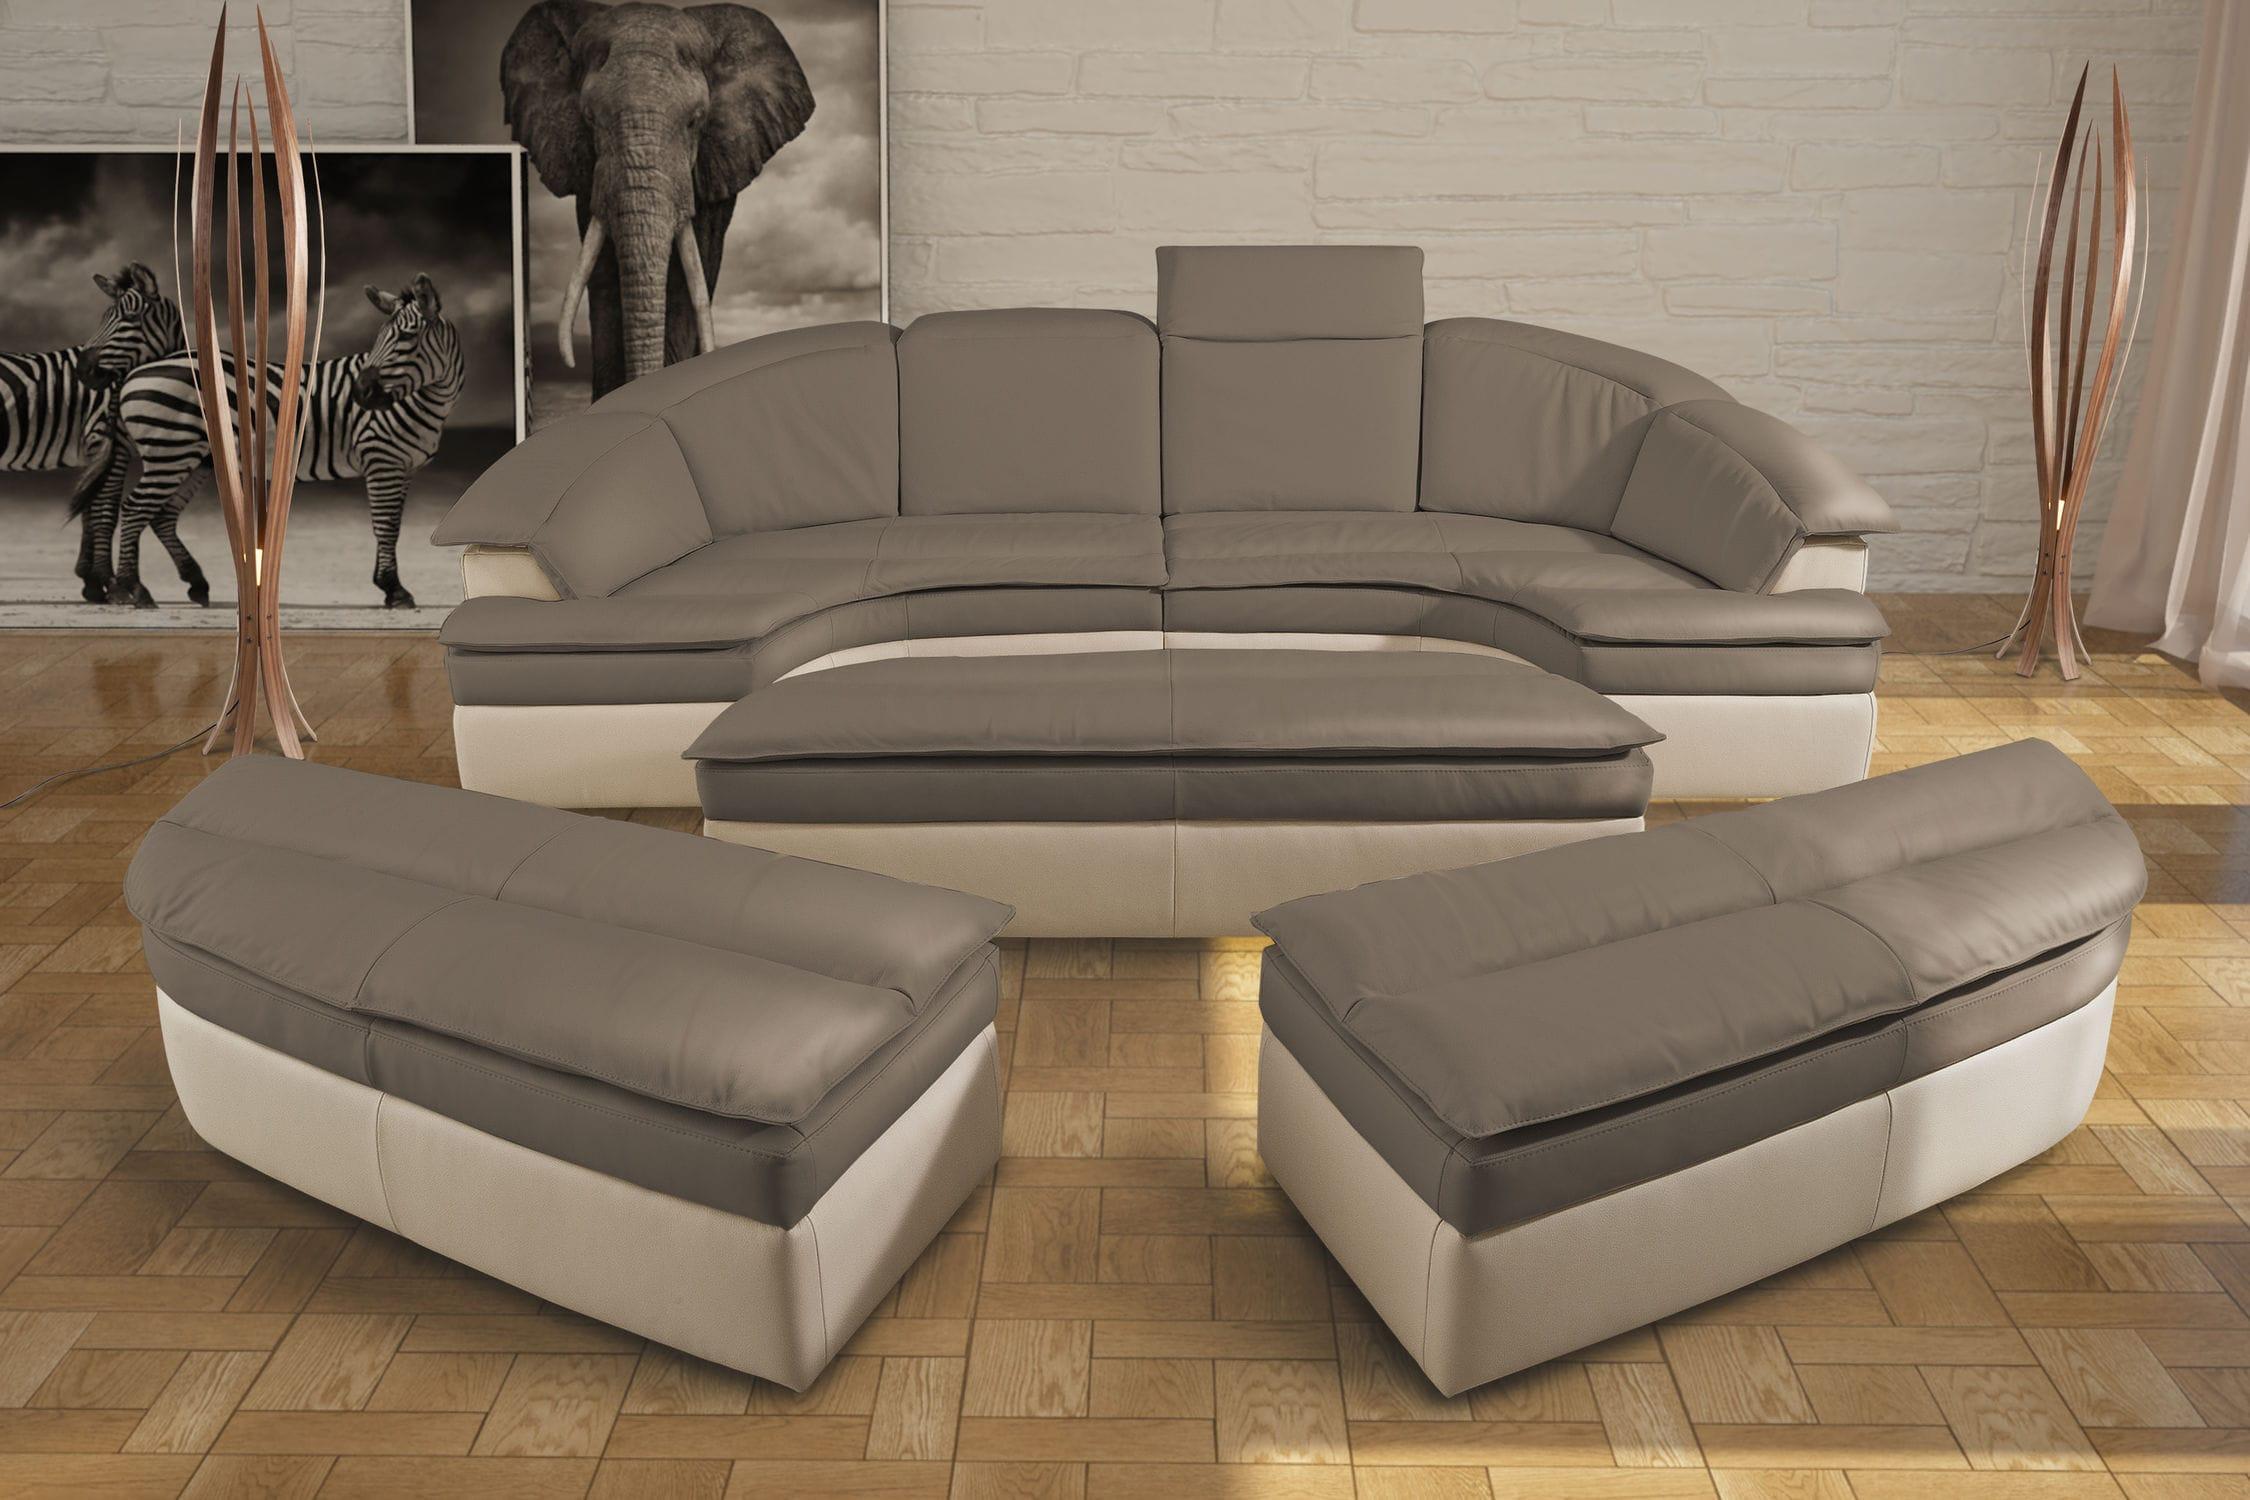 Modulierbares Sofa Halbrund Modern Leder Galaxy Combi Nieri